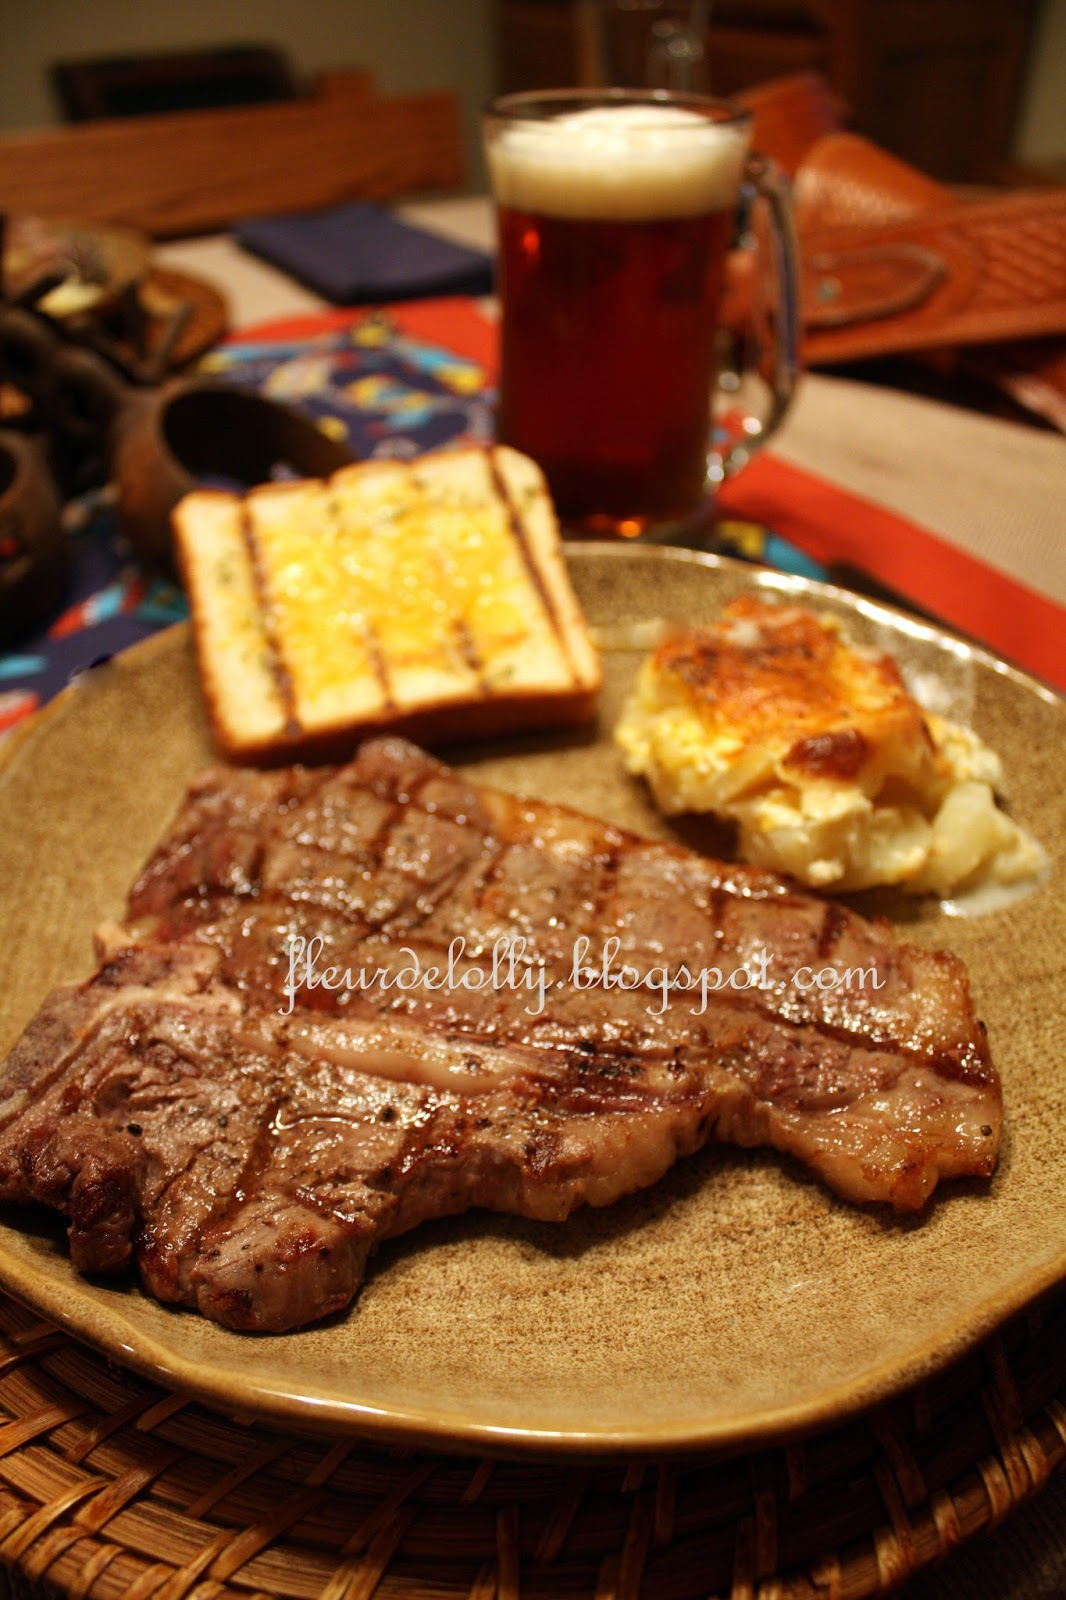 Fleur de Lolly: Tennessee T-Bone Steaks with Whiskey Butter